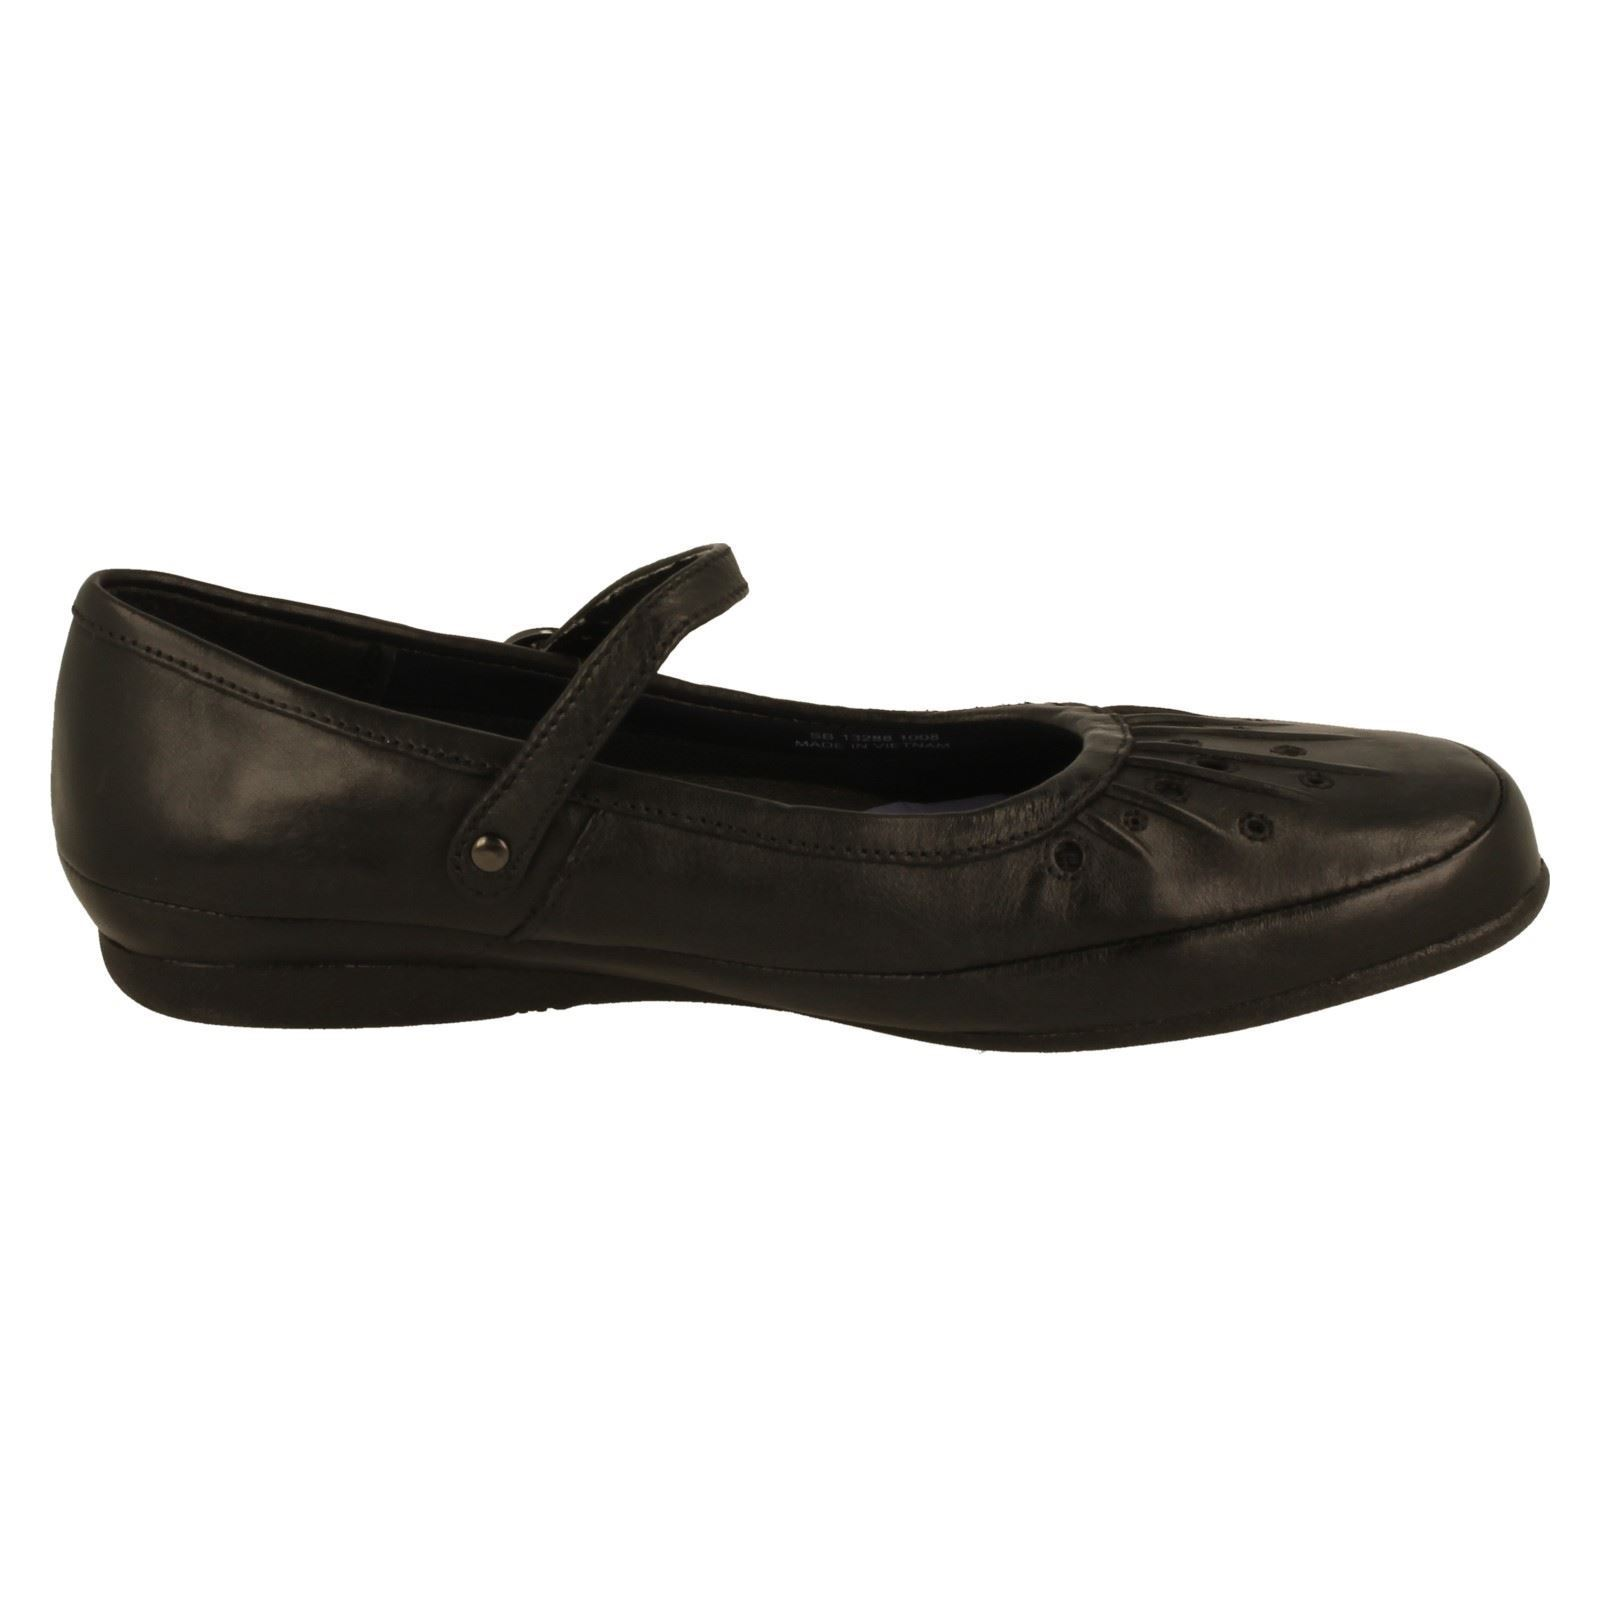 Clarks Girls Mary Jane School Shoes - Hazel